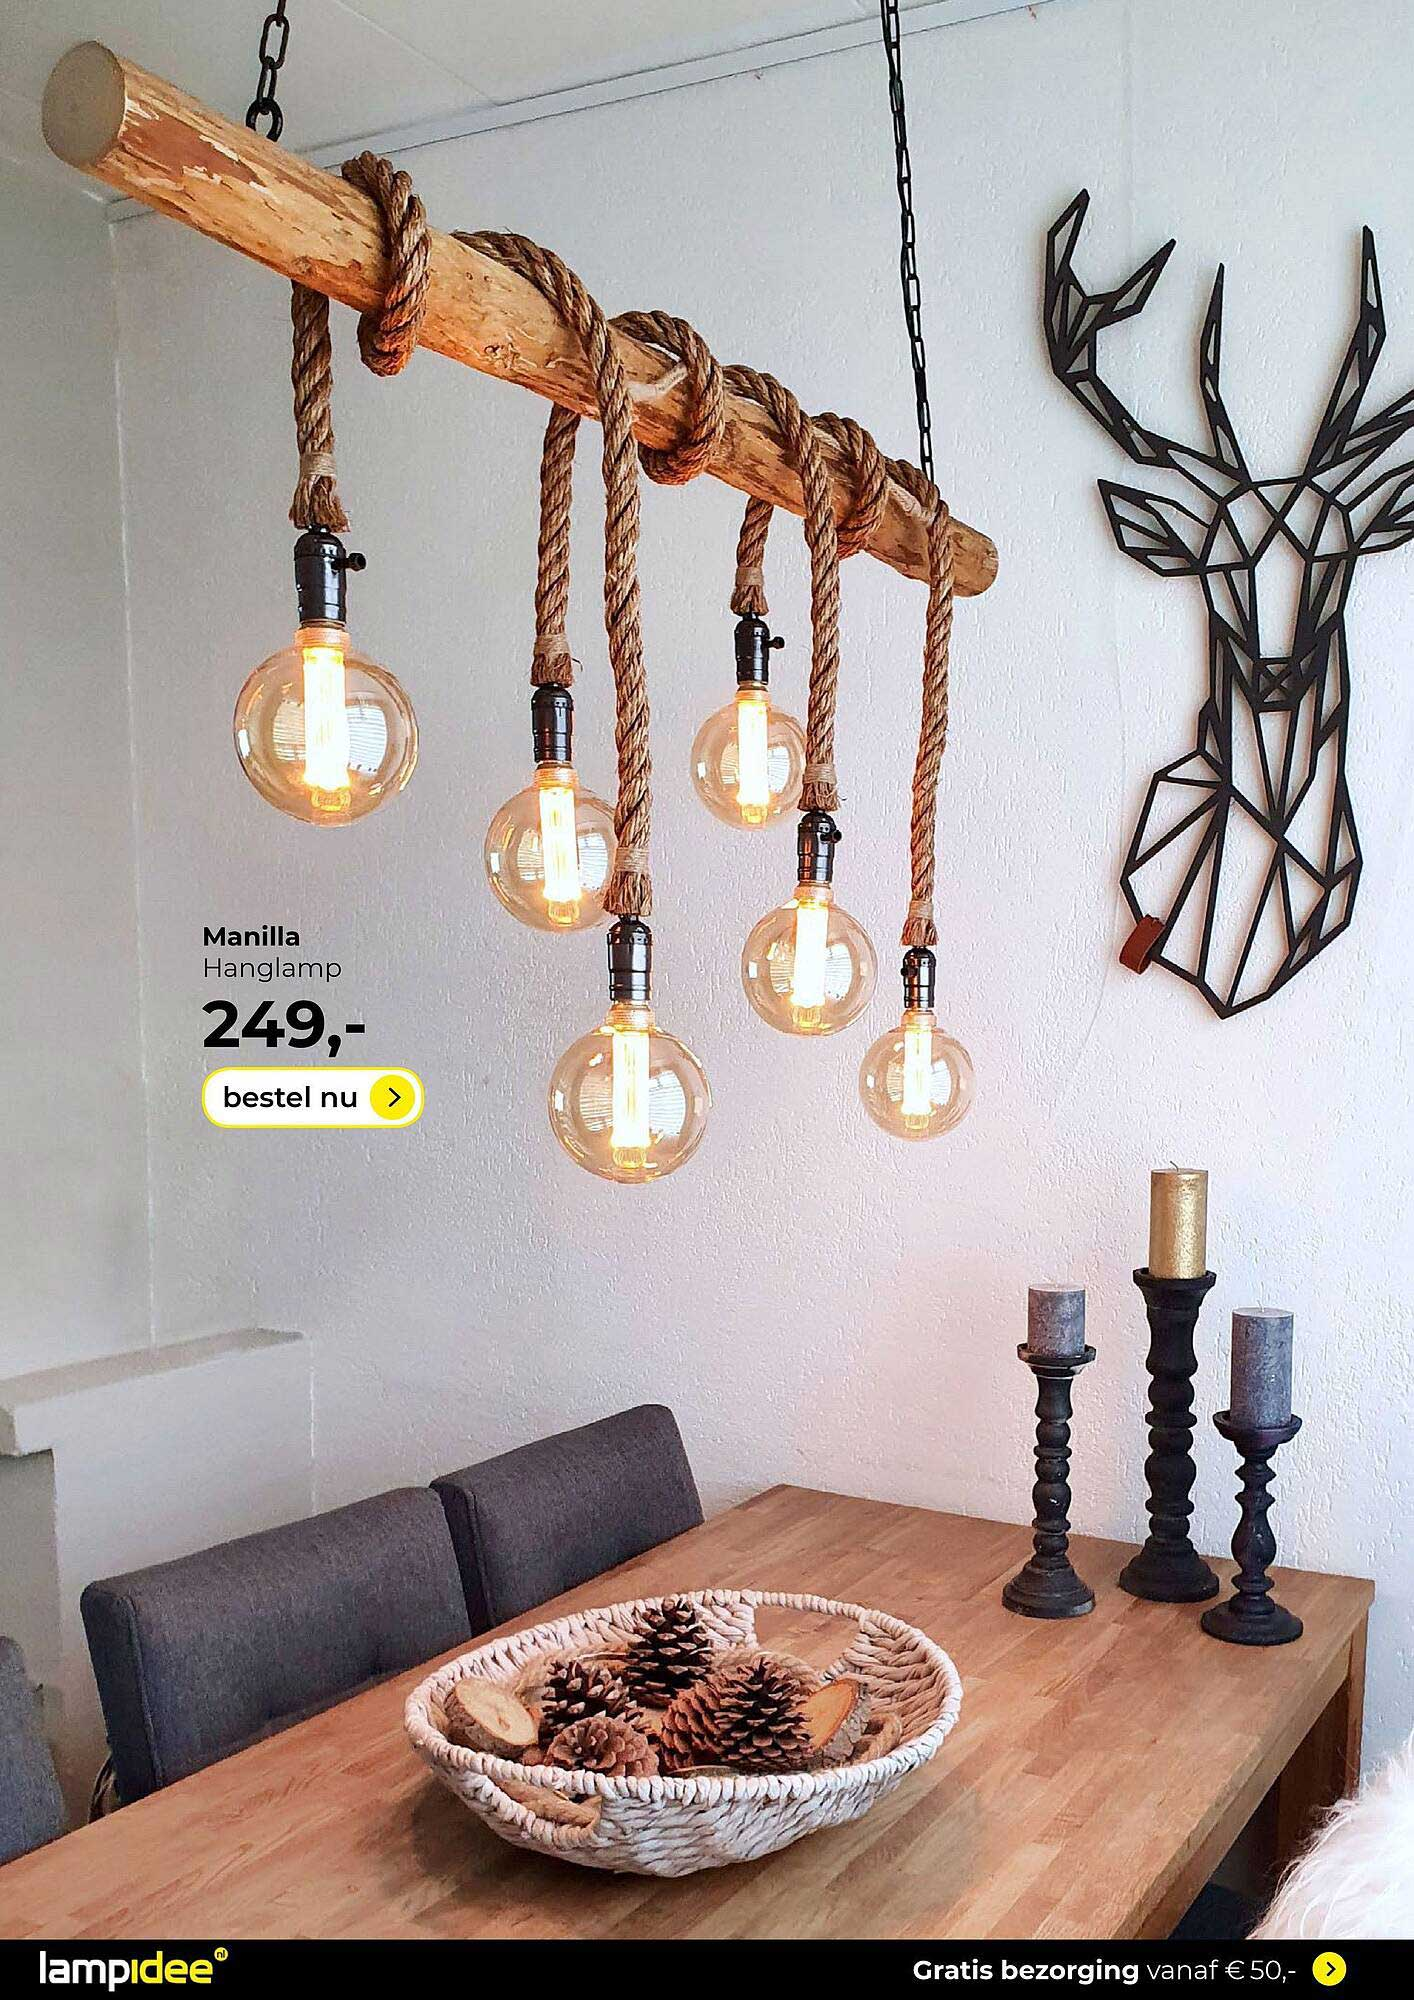 Lampidee Manilla Hanglamp